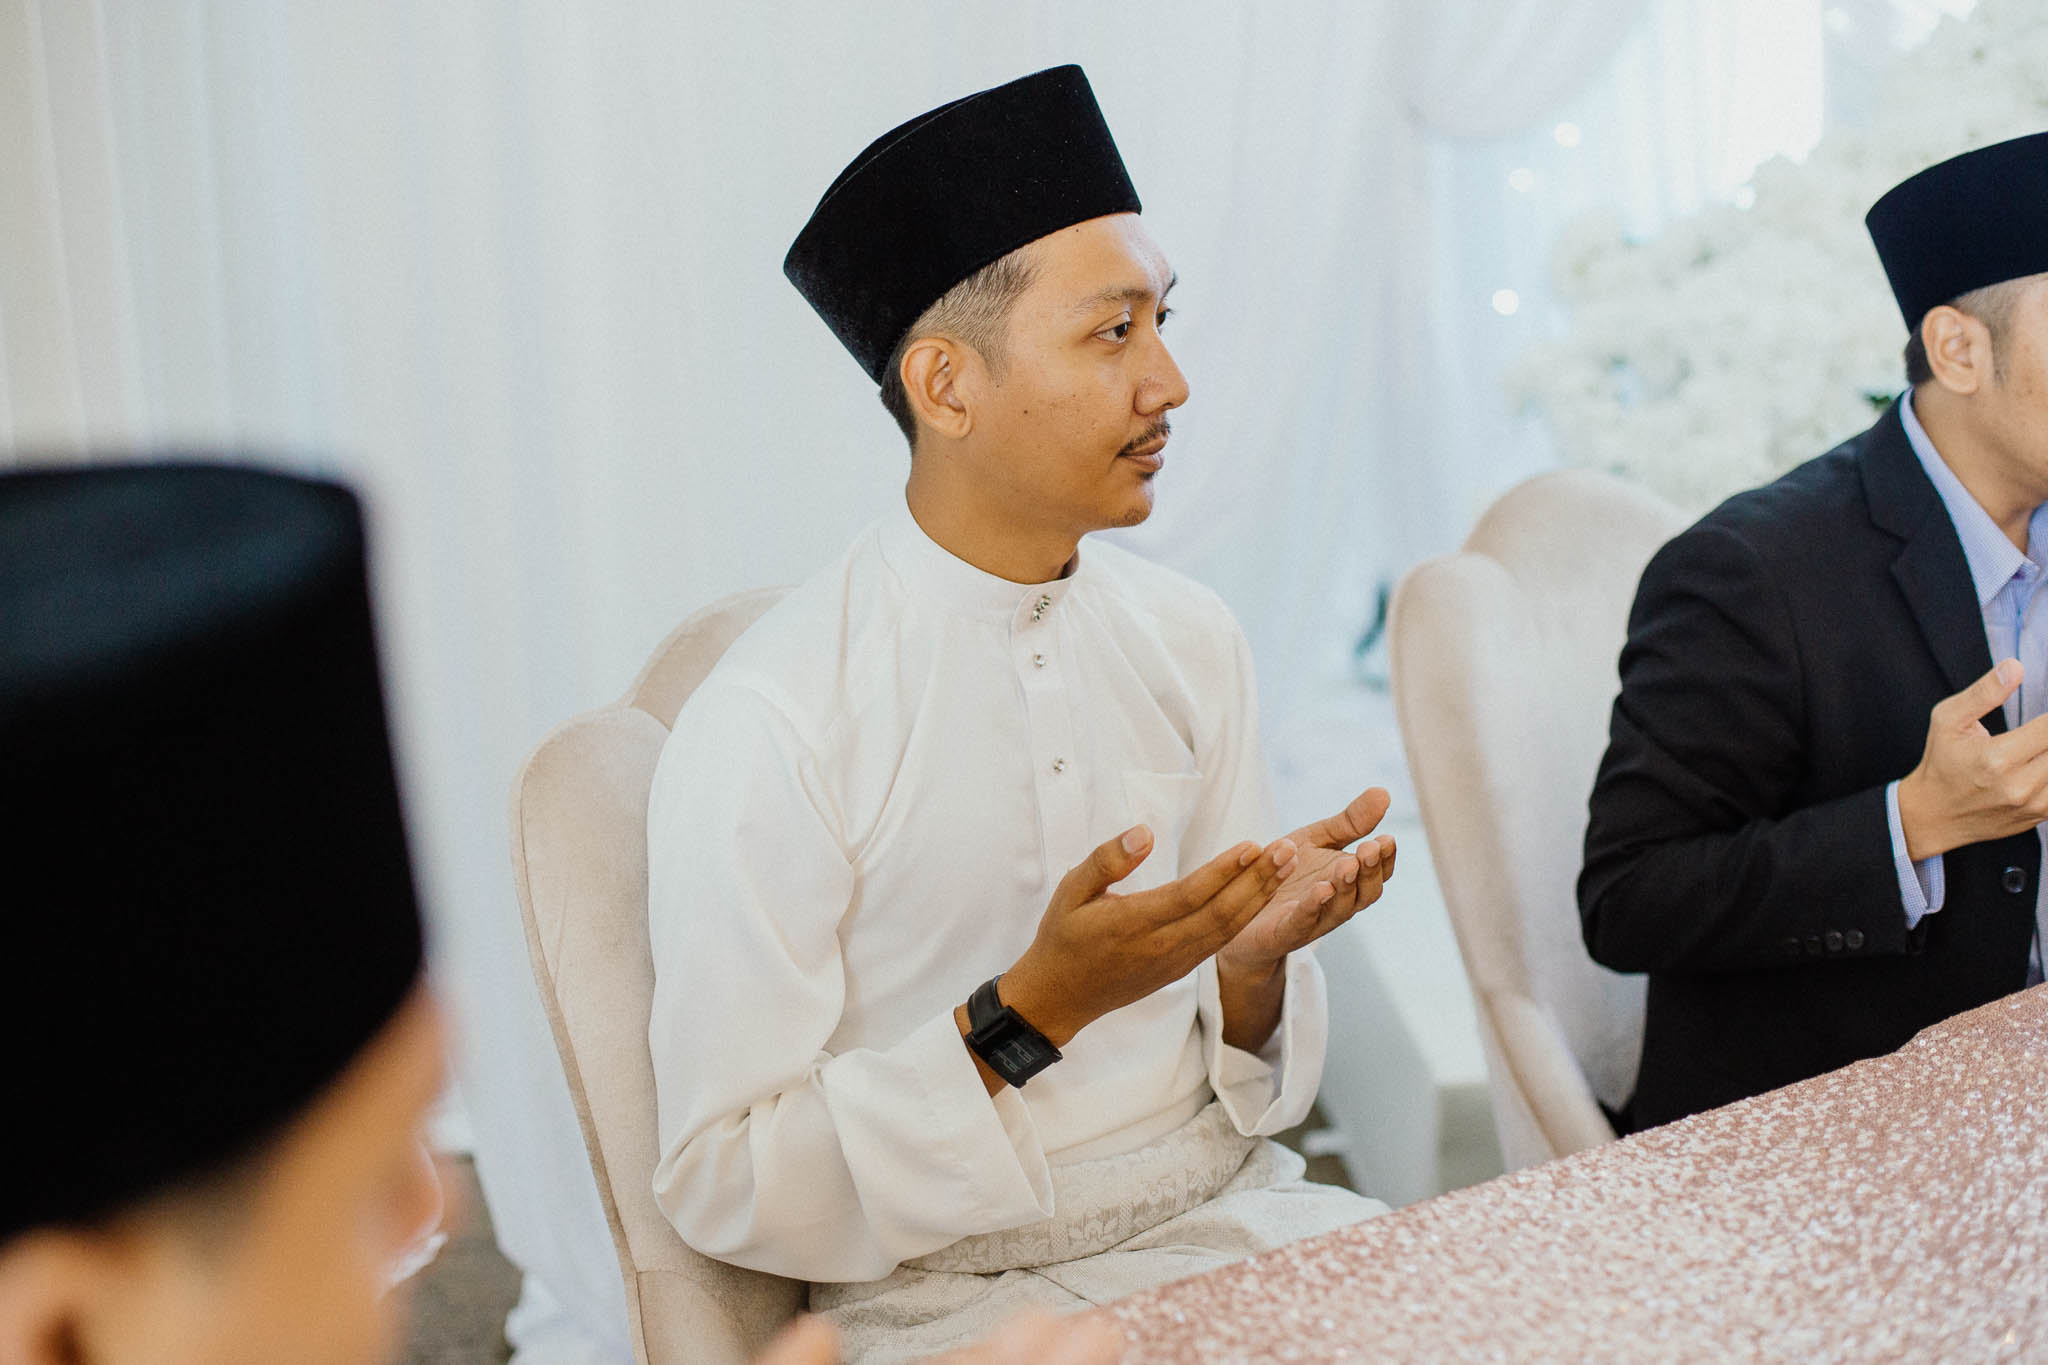 singapore-wedding-photographer-addafiq-nufail-016.jpg